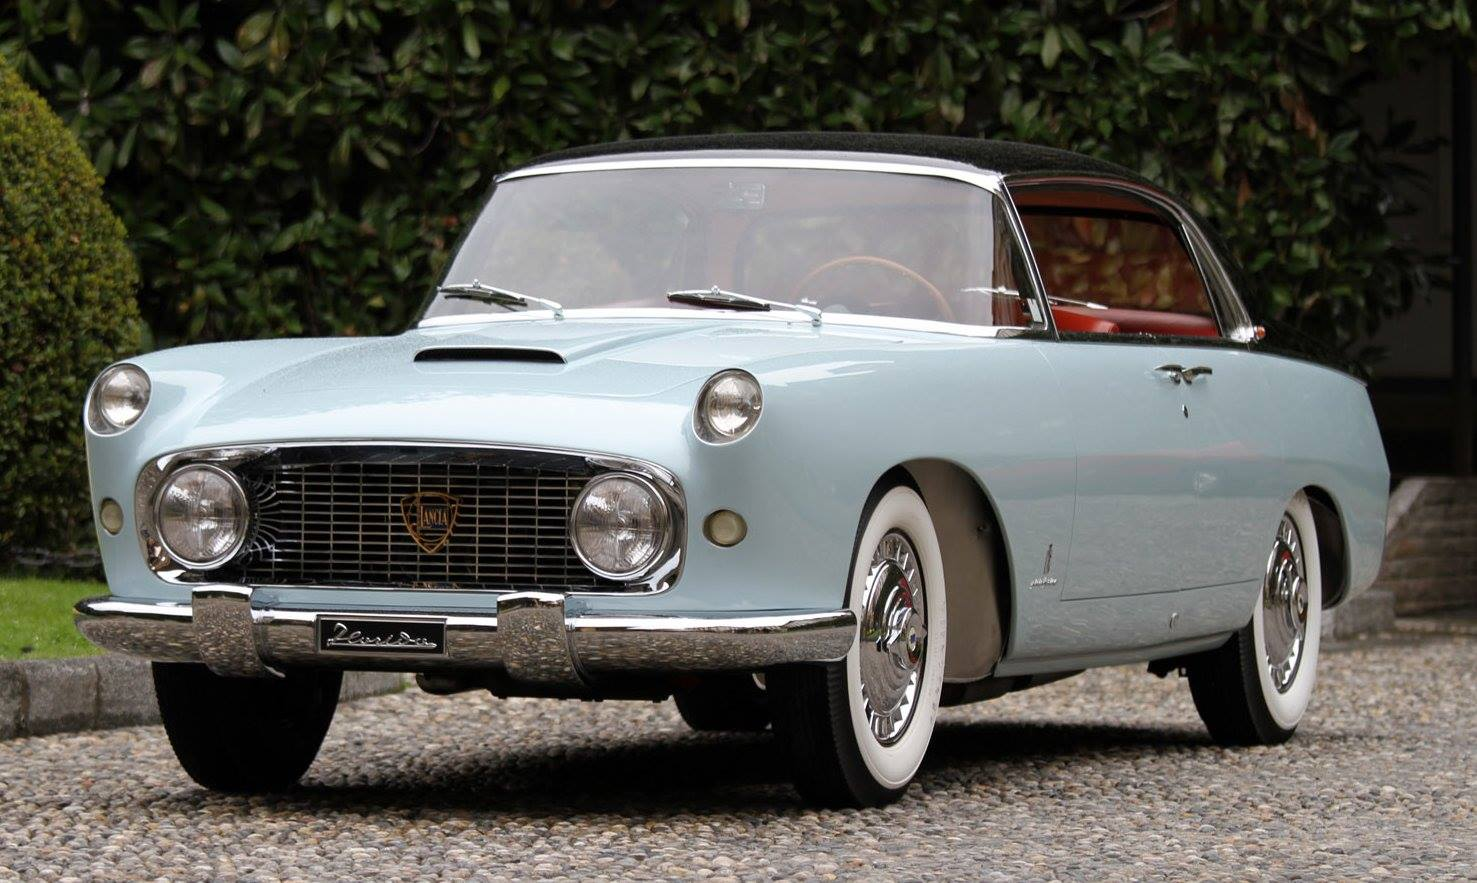 Lancia-Aurelia-B-56-Florida-1955-1